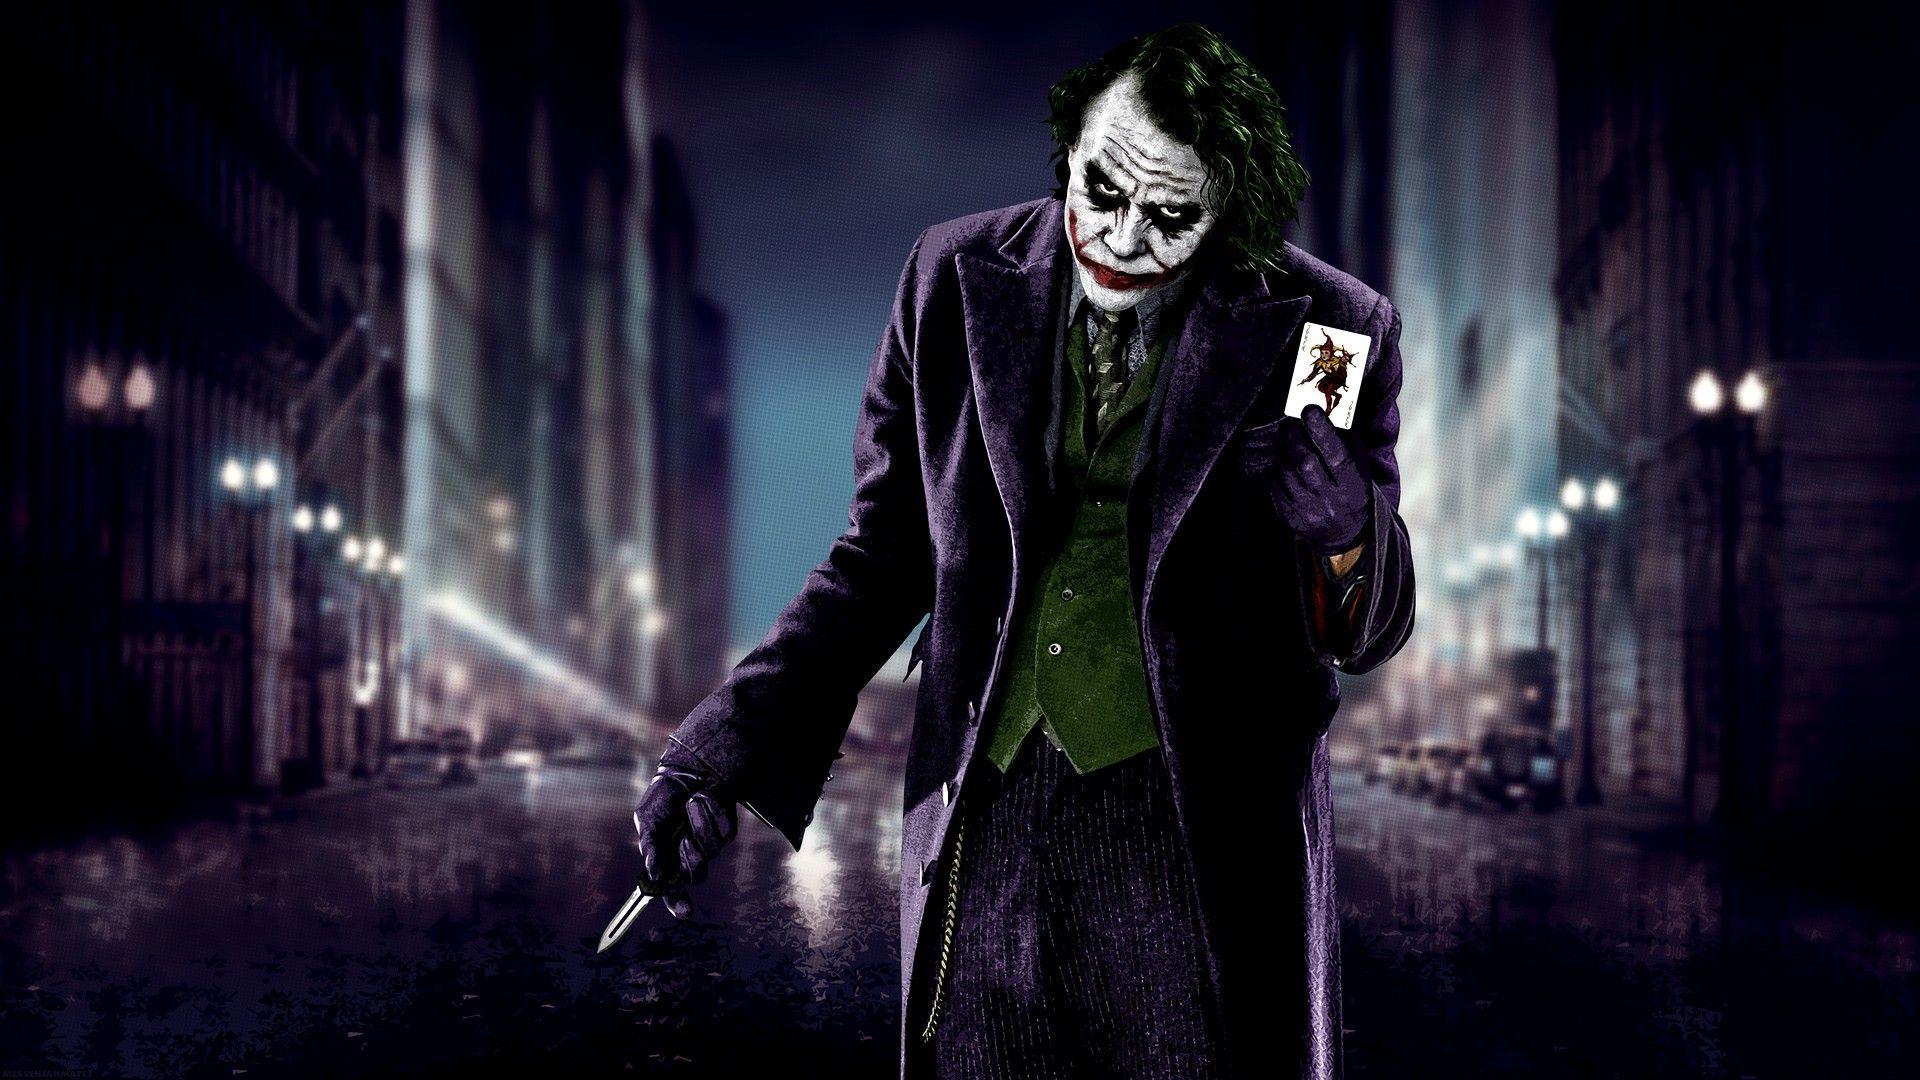 Heath Ledger Knife Cards The Dark Knight Batman